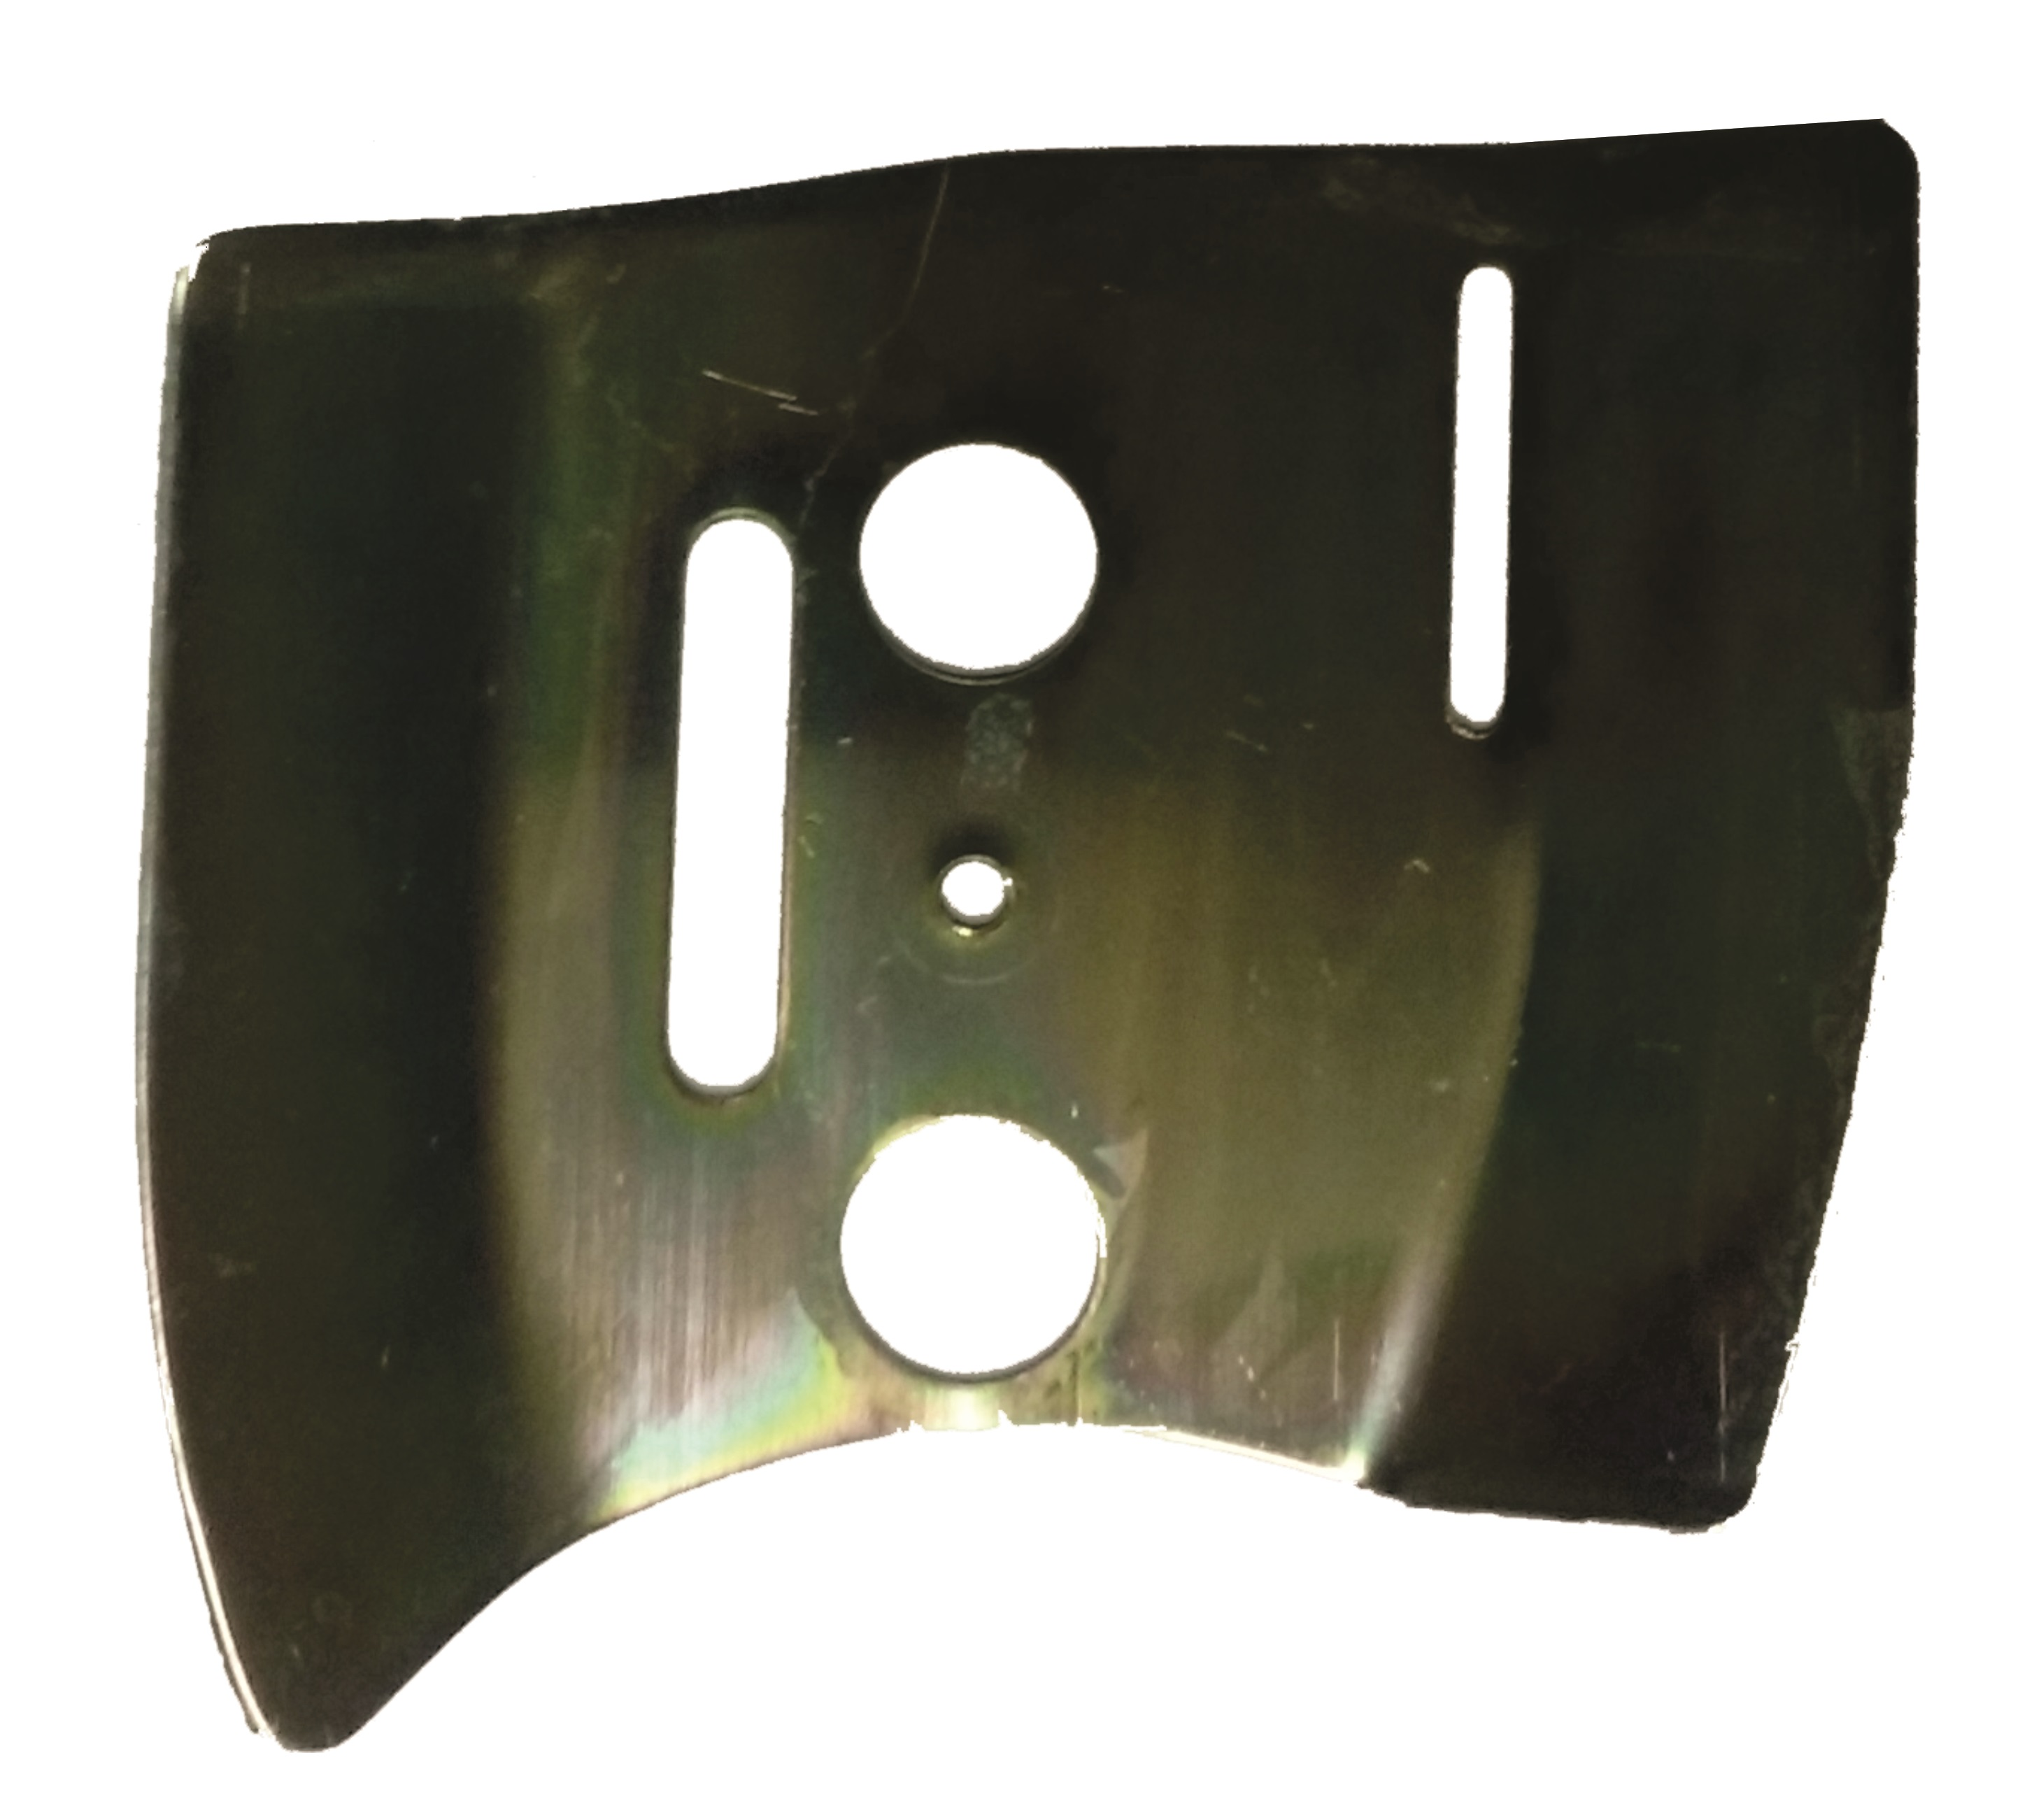 Comprar Chapa guia interna do sabre st-08/ts-350